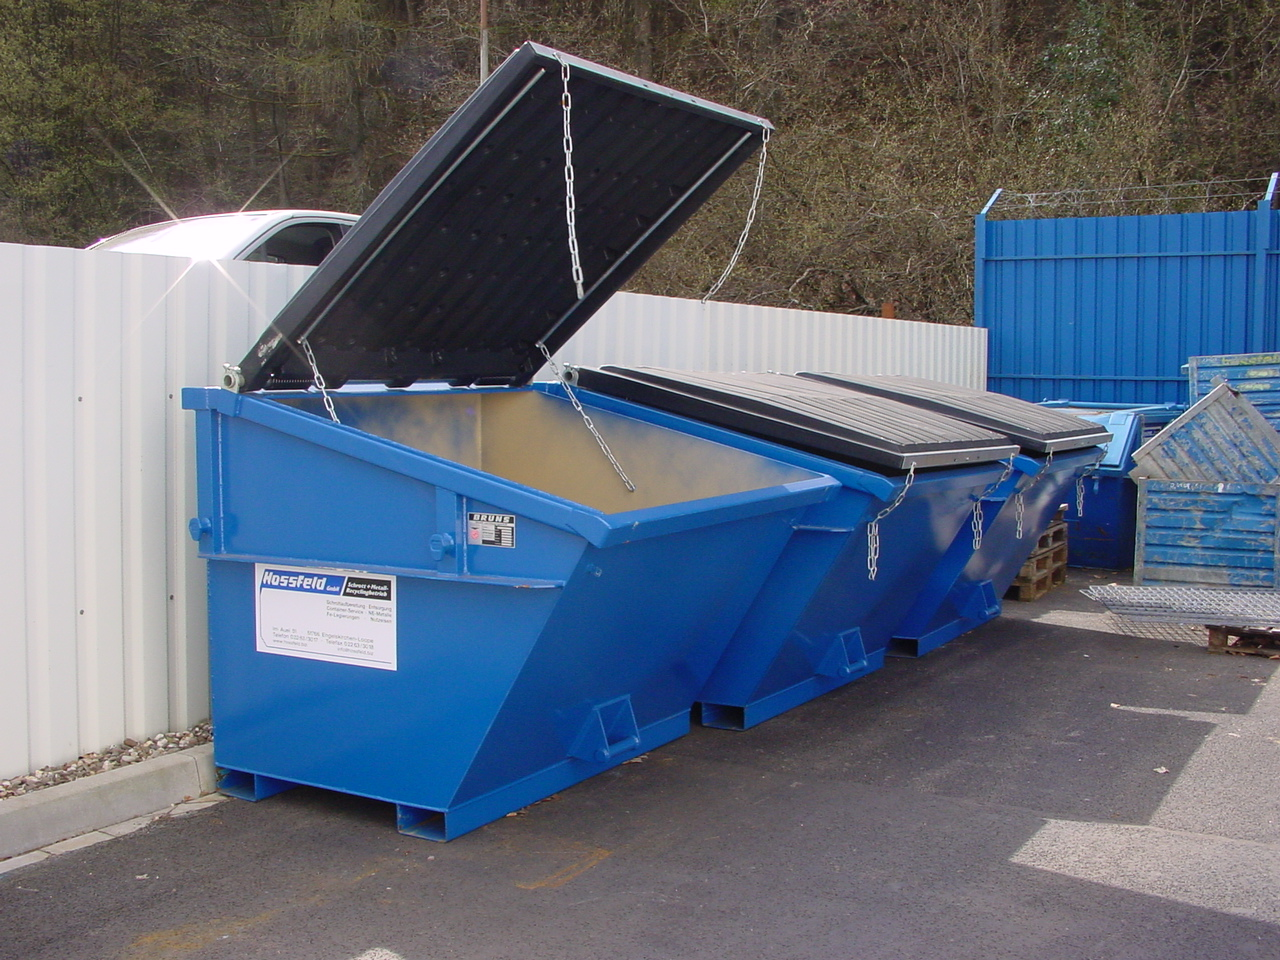 Gedeckelter Absetzcontainer | Hossfeld GmbH in Engelskirchen